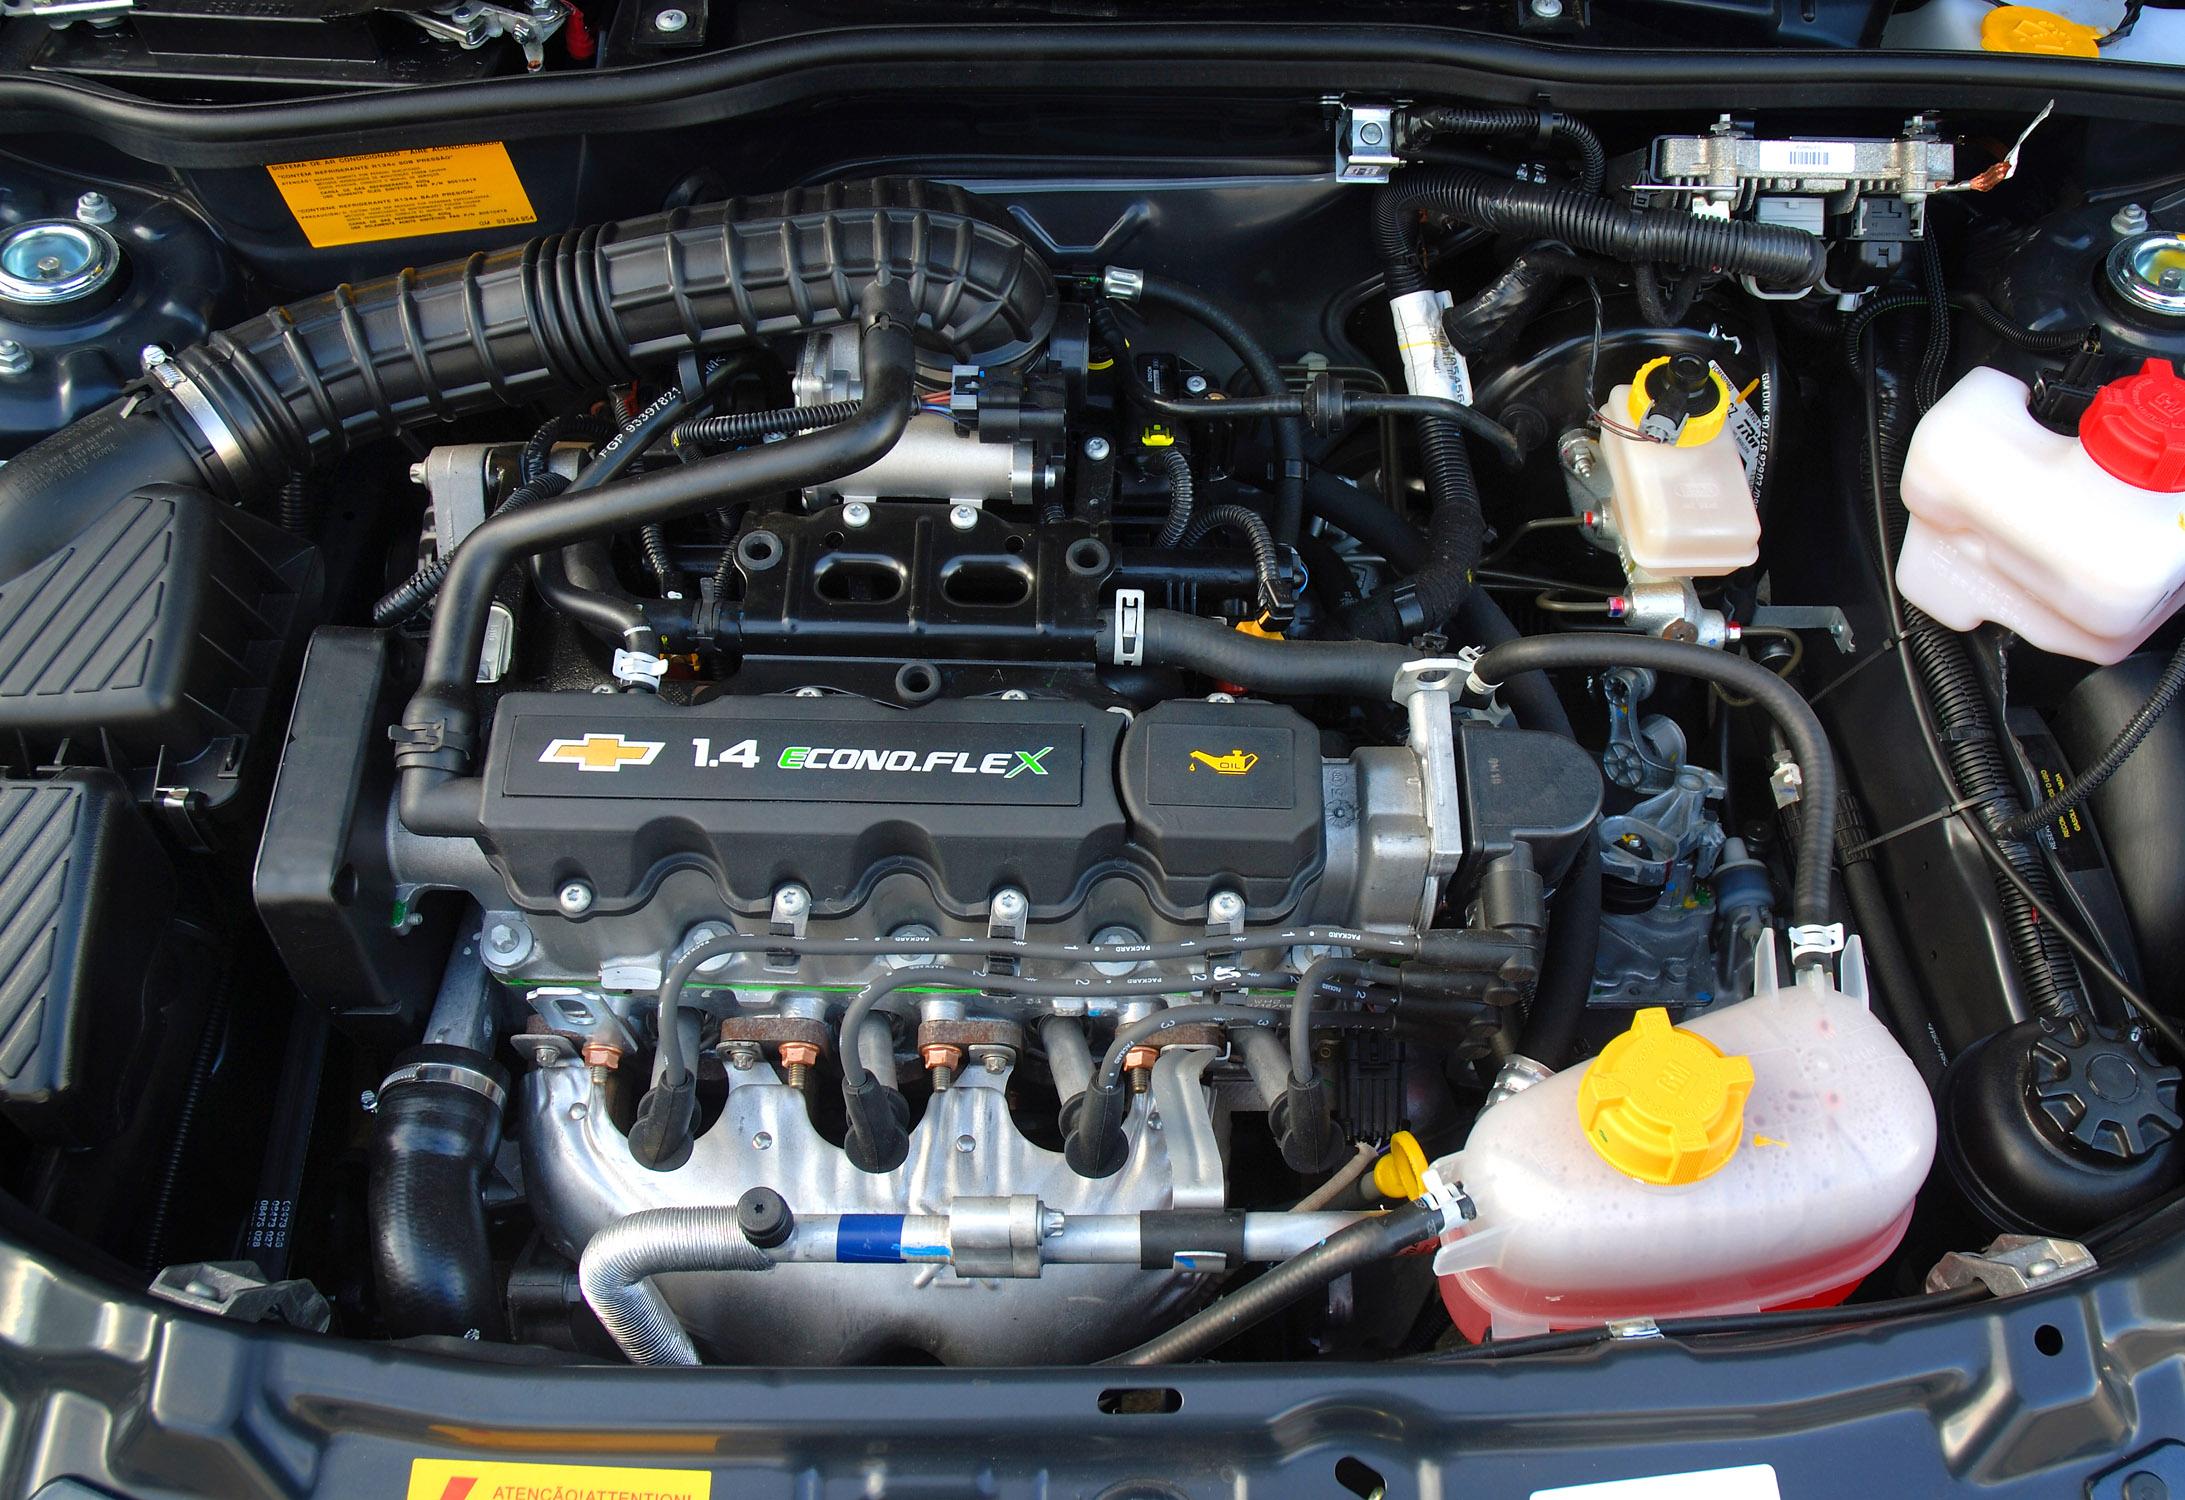 0_1546657031743_motor-1-4-econoflex.jpg